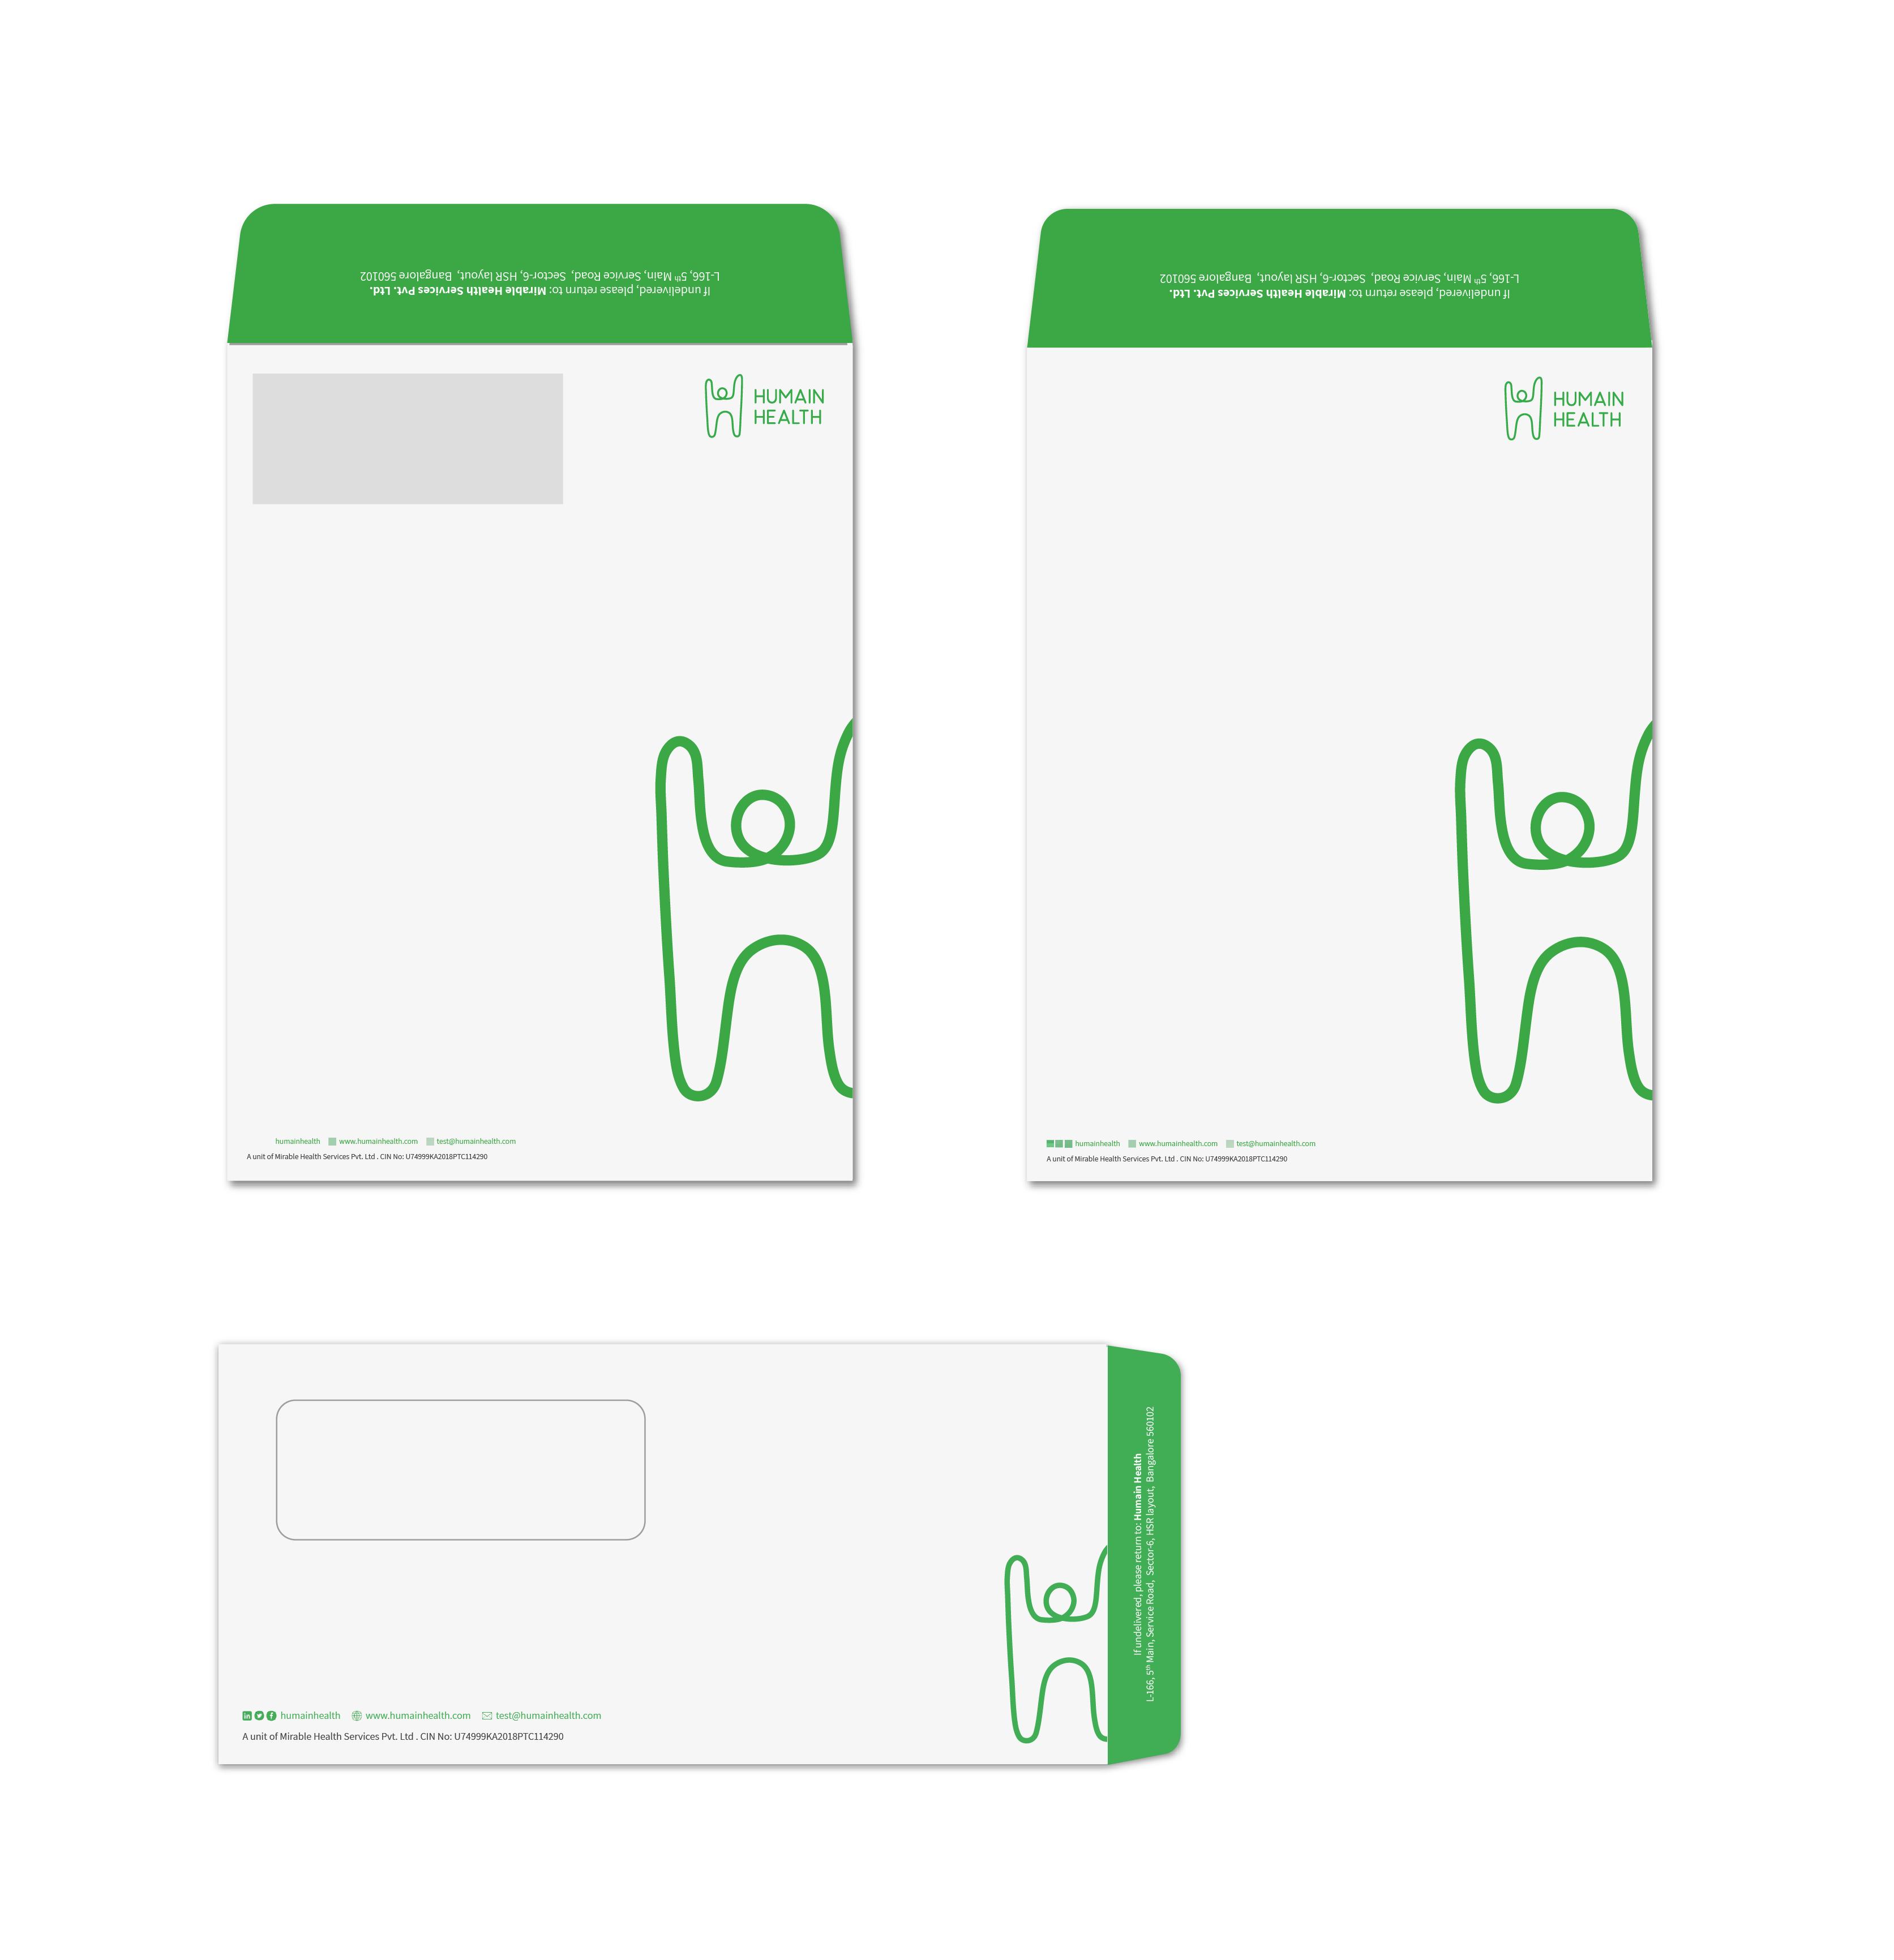 Healthcare Rezonant Design Humain Design 38 01